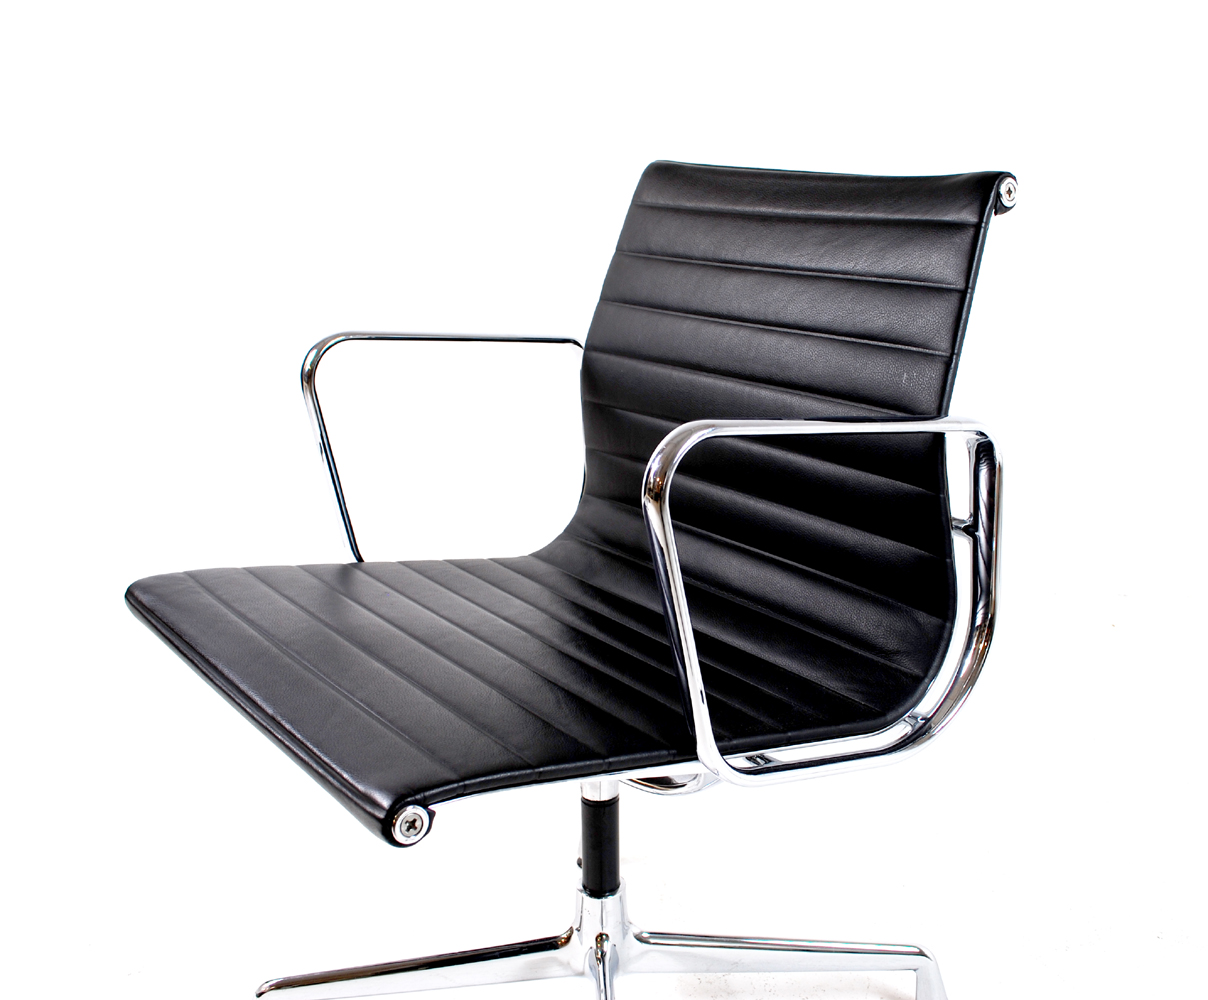 Charles Eames Stoel : Charles eames stoel vitra charles eames stoel replica